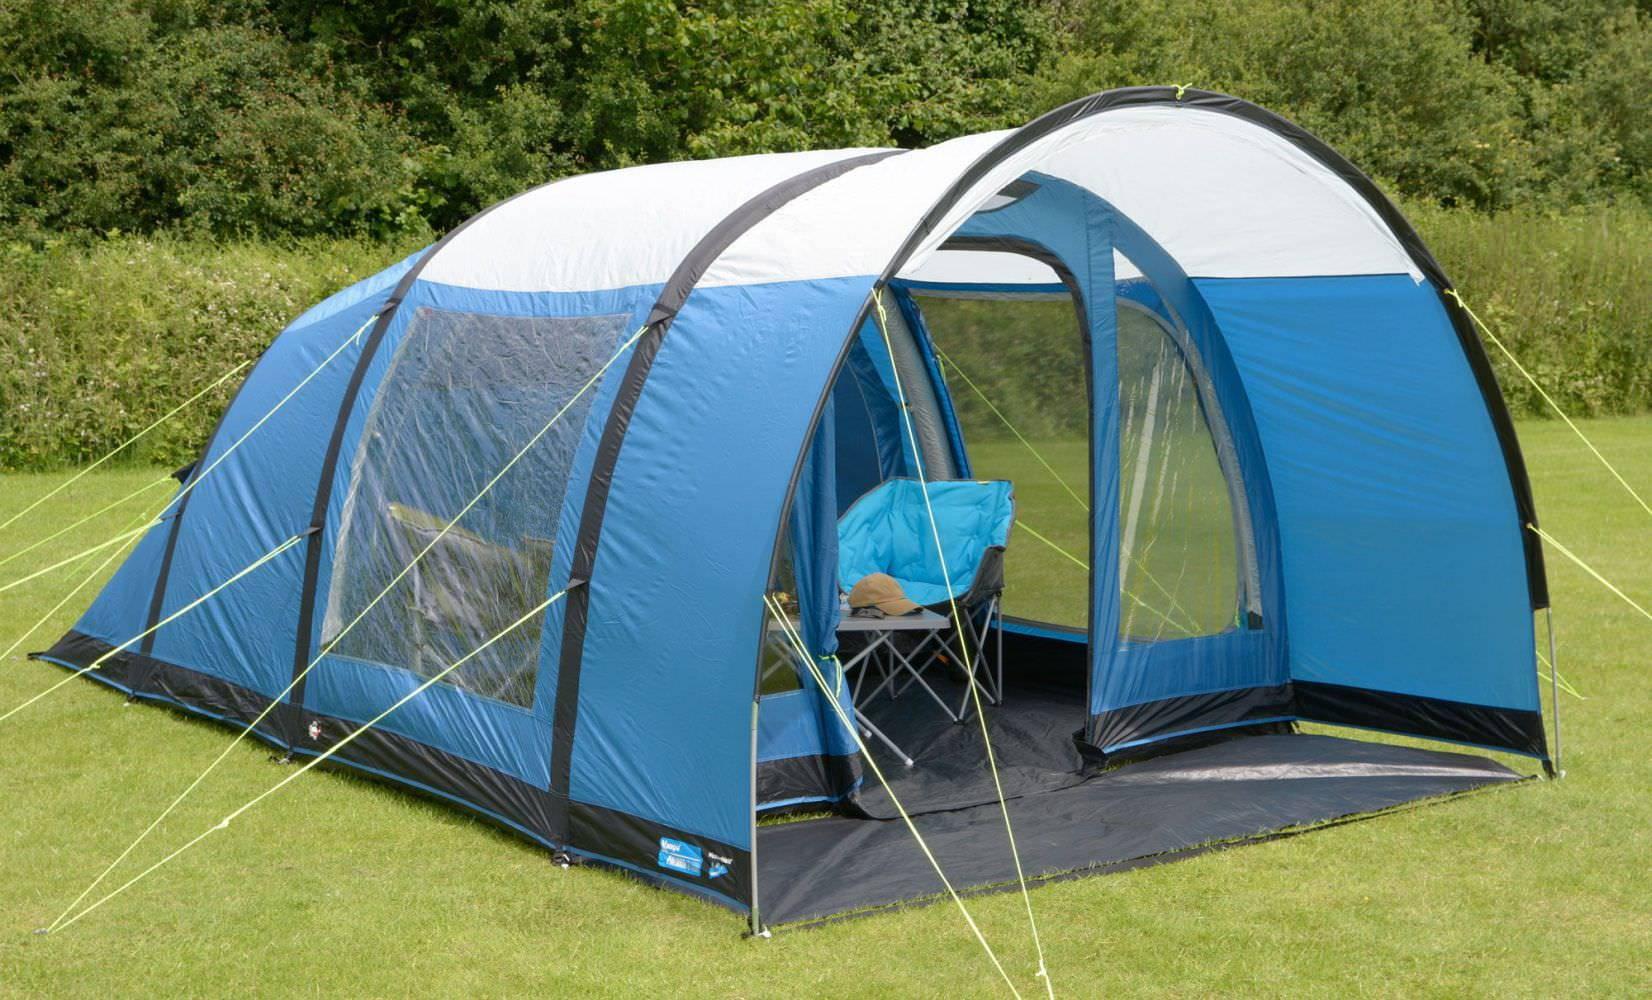 kampa paloma 4 aufblasbares zelt online kaufen rennerxxl. Black Bedroom Furniture Sets. Home Design Ideas